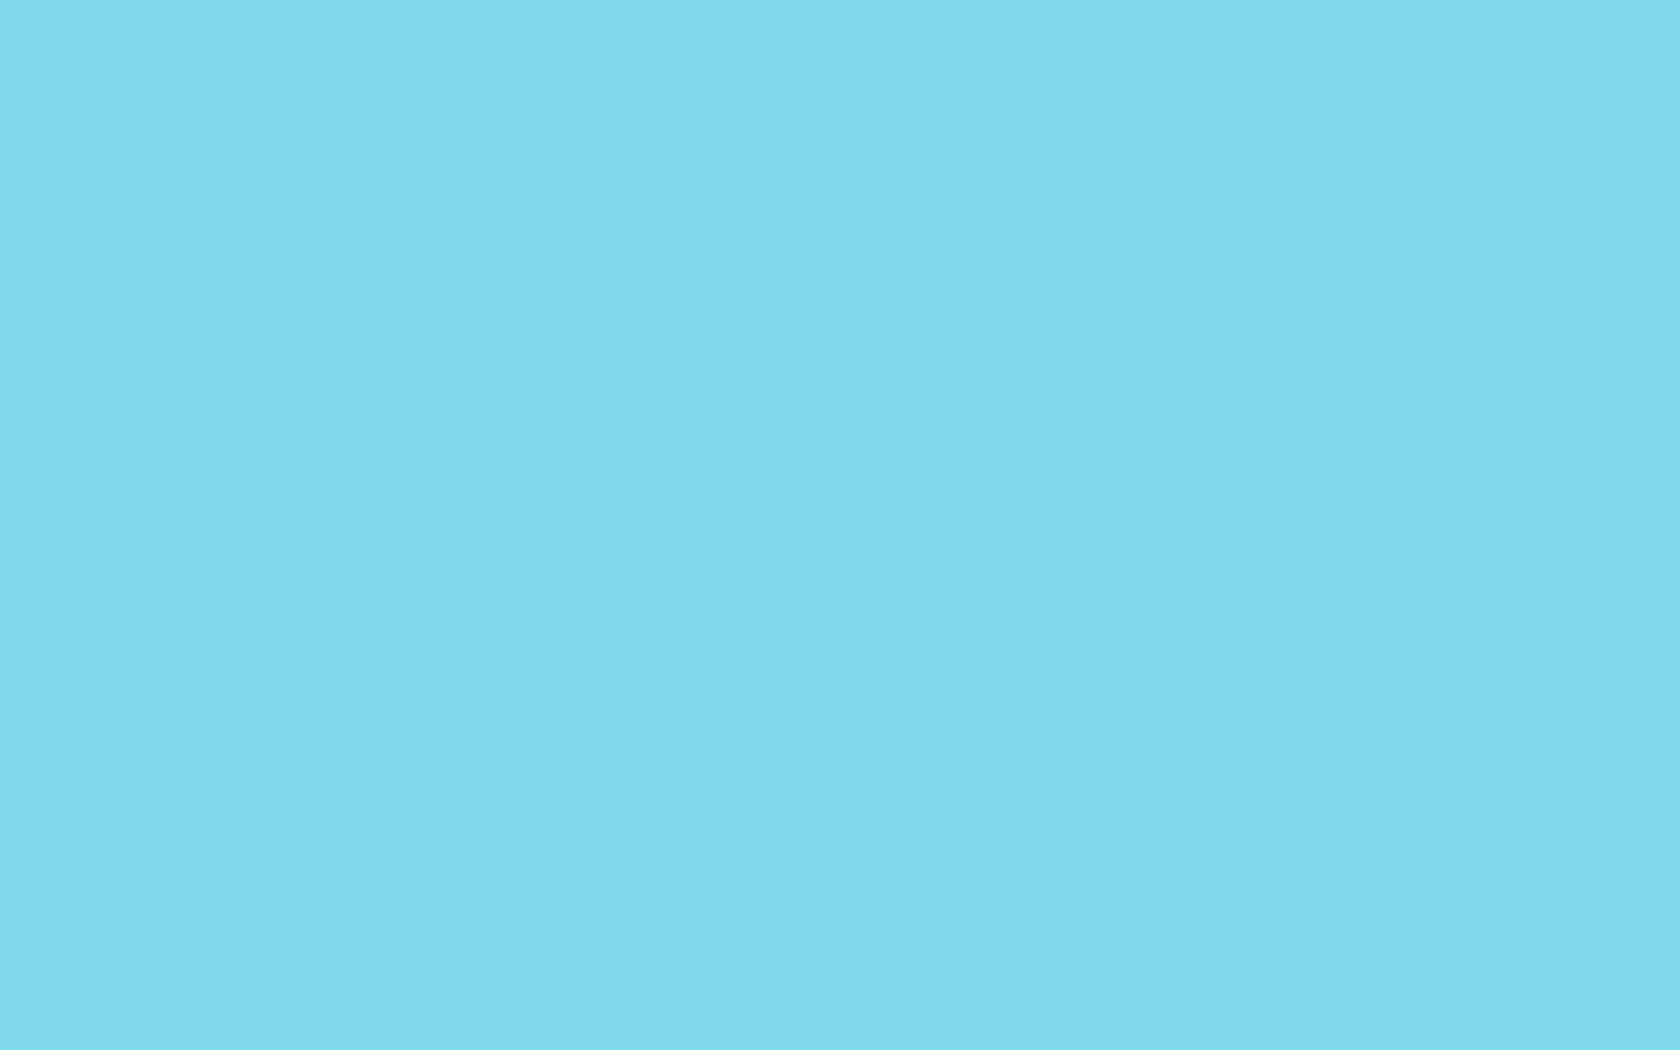 1680x1050 Medium Sky Blue Solid Color Background